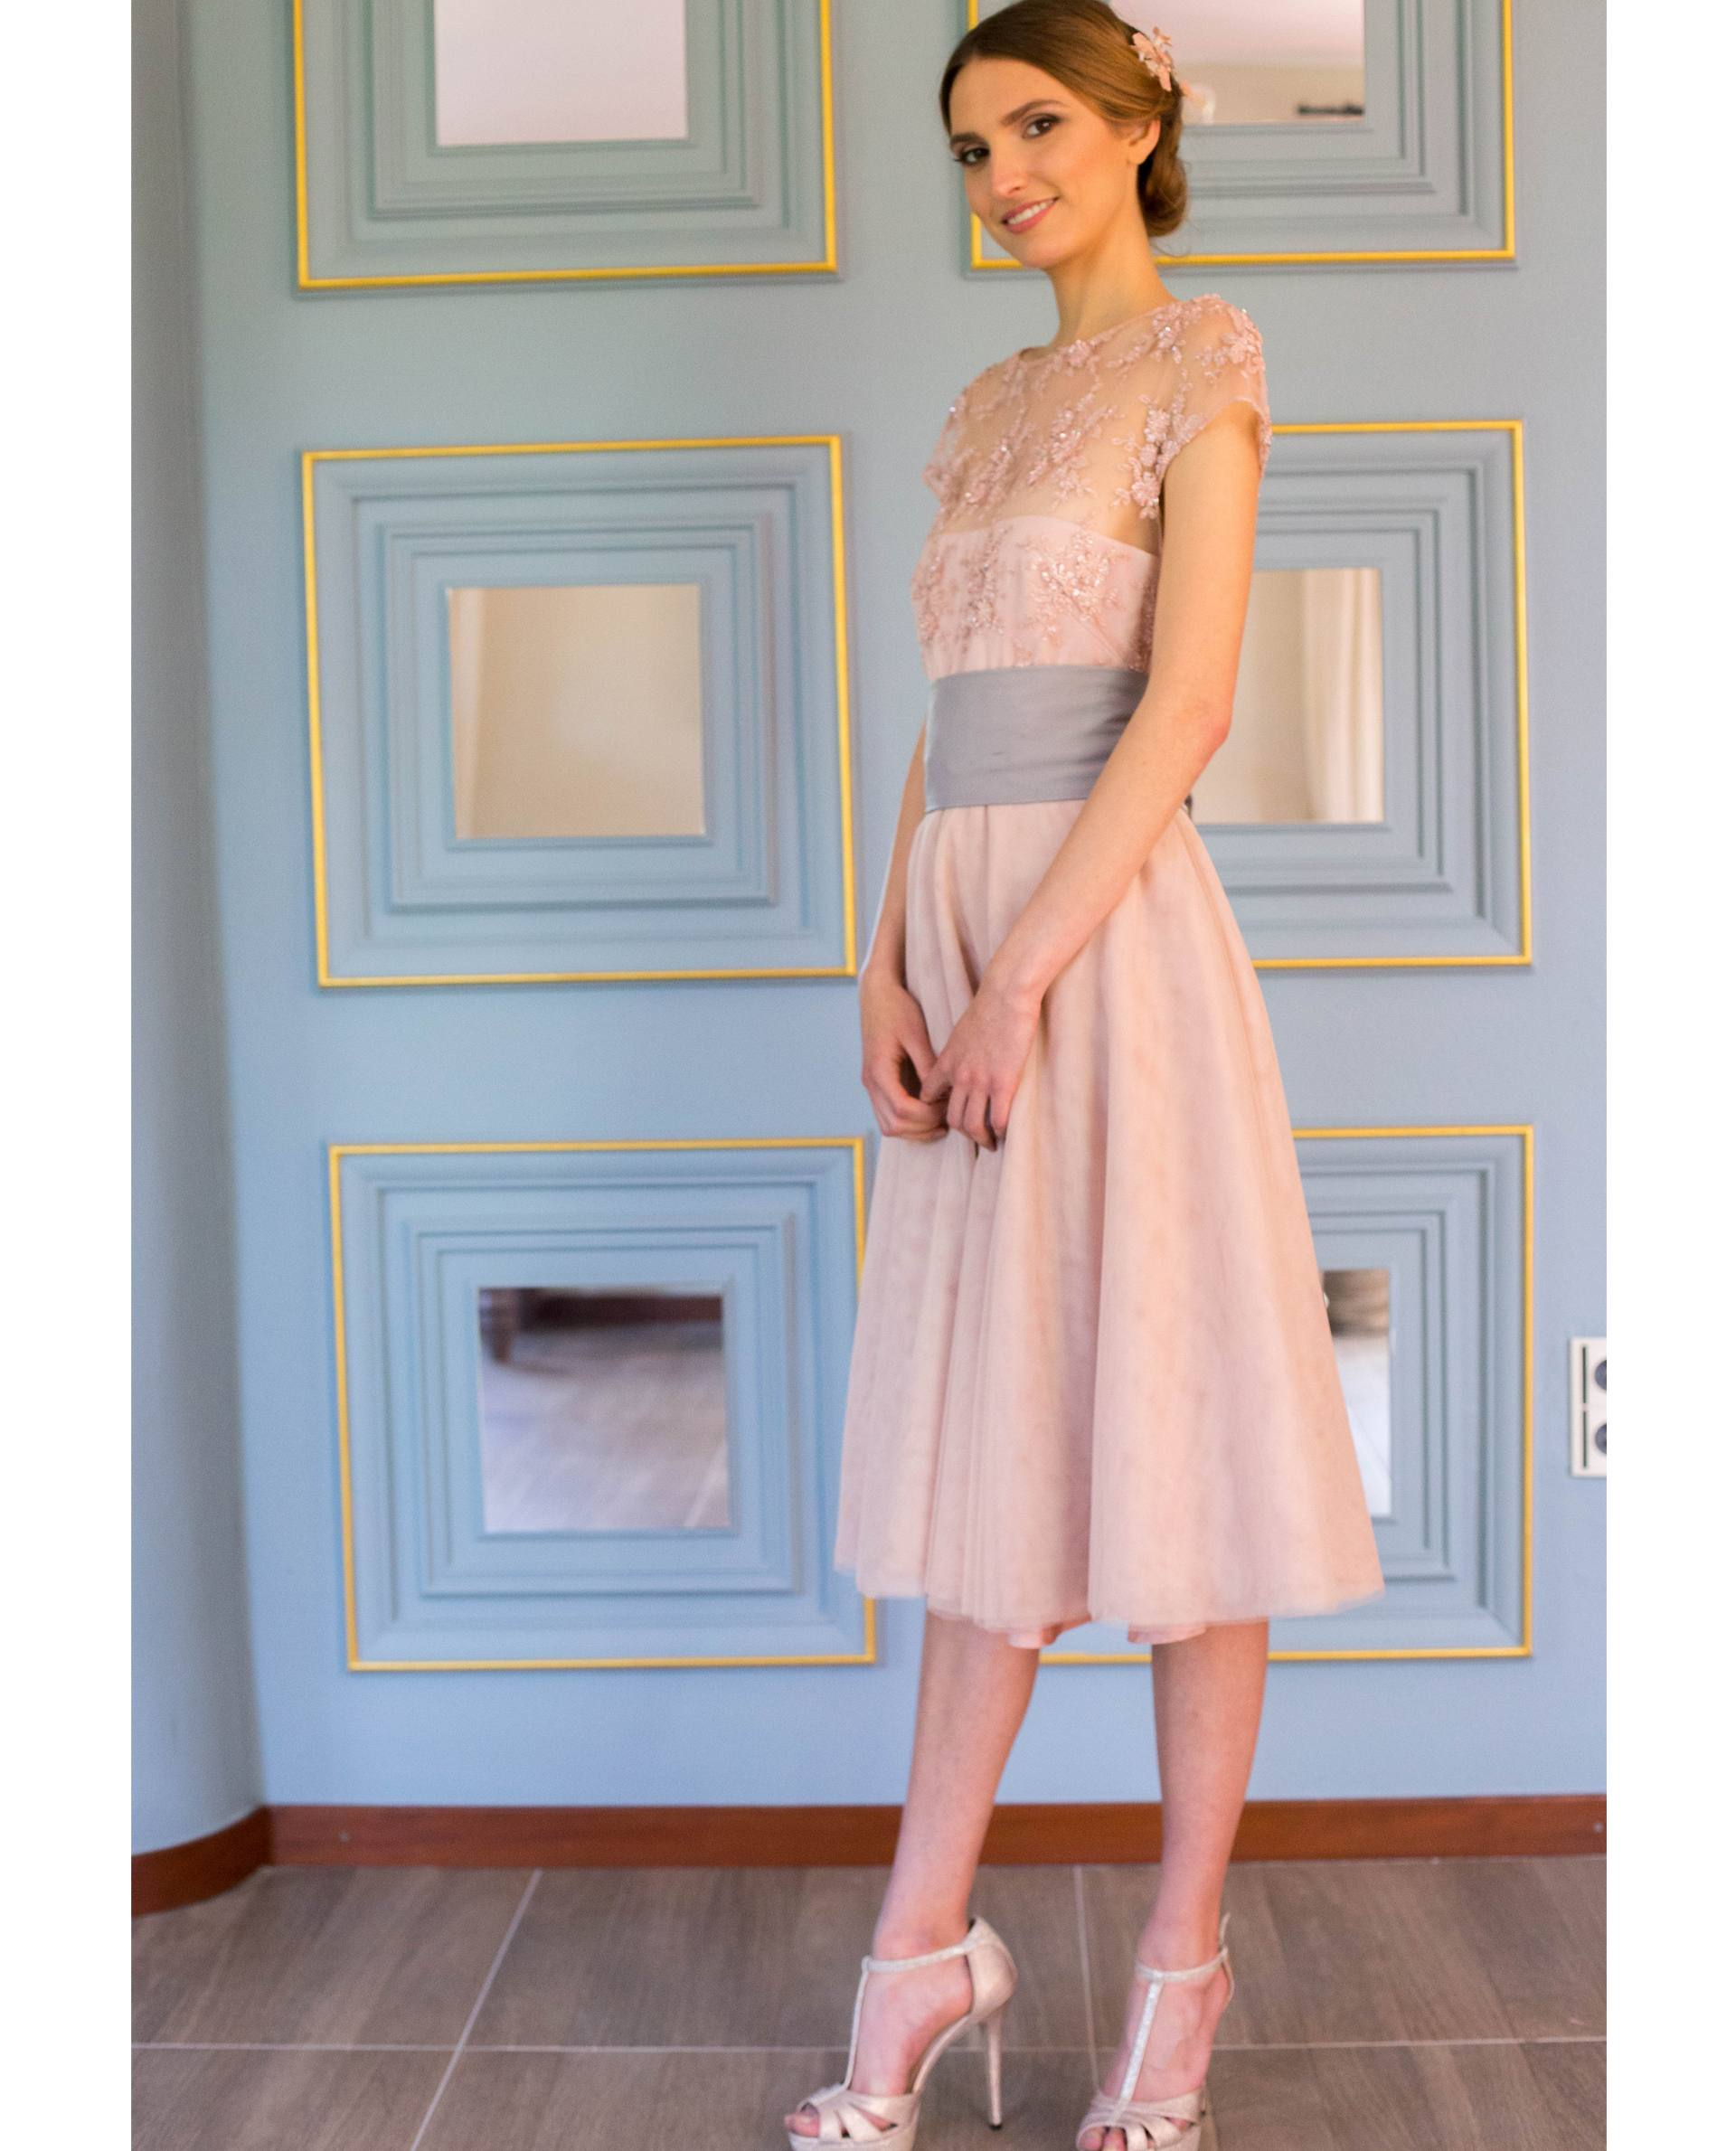 ATELIER-NATURE 2018/19 - VESTIDOS - vestido fiesta CAROLA rosa palo